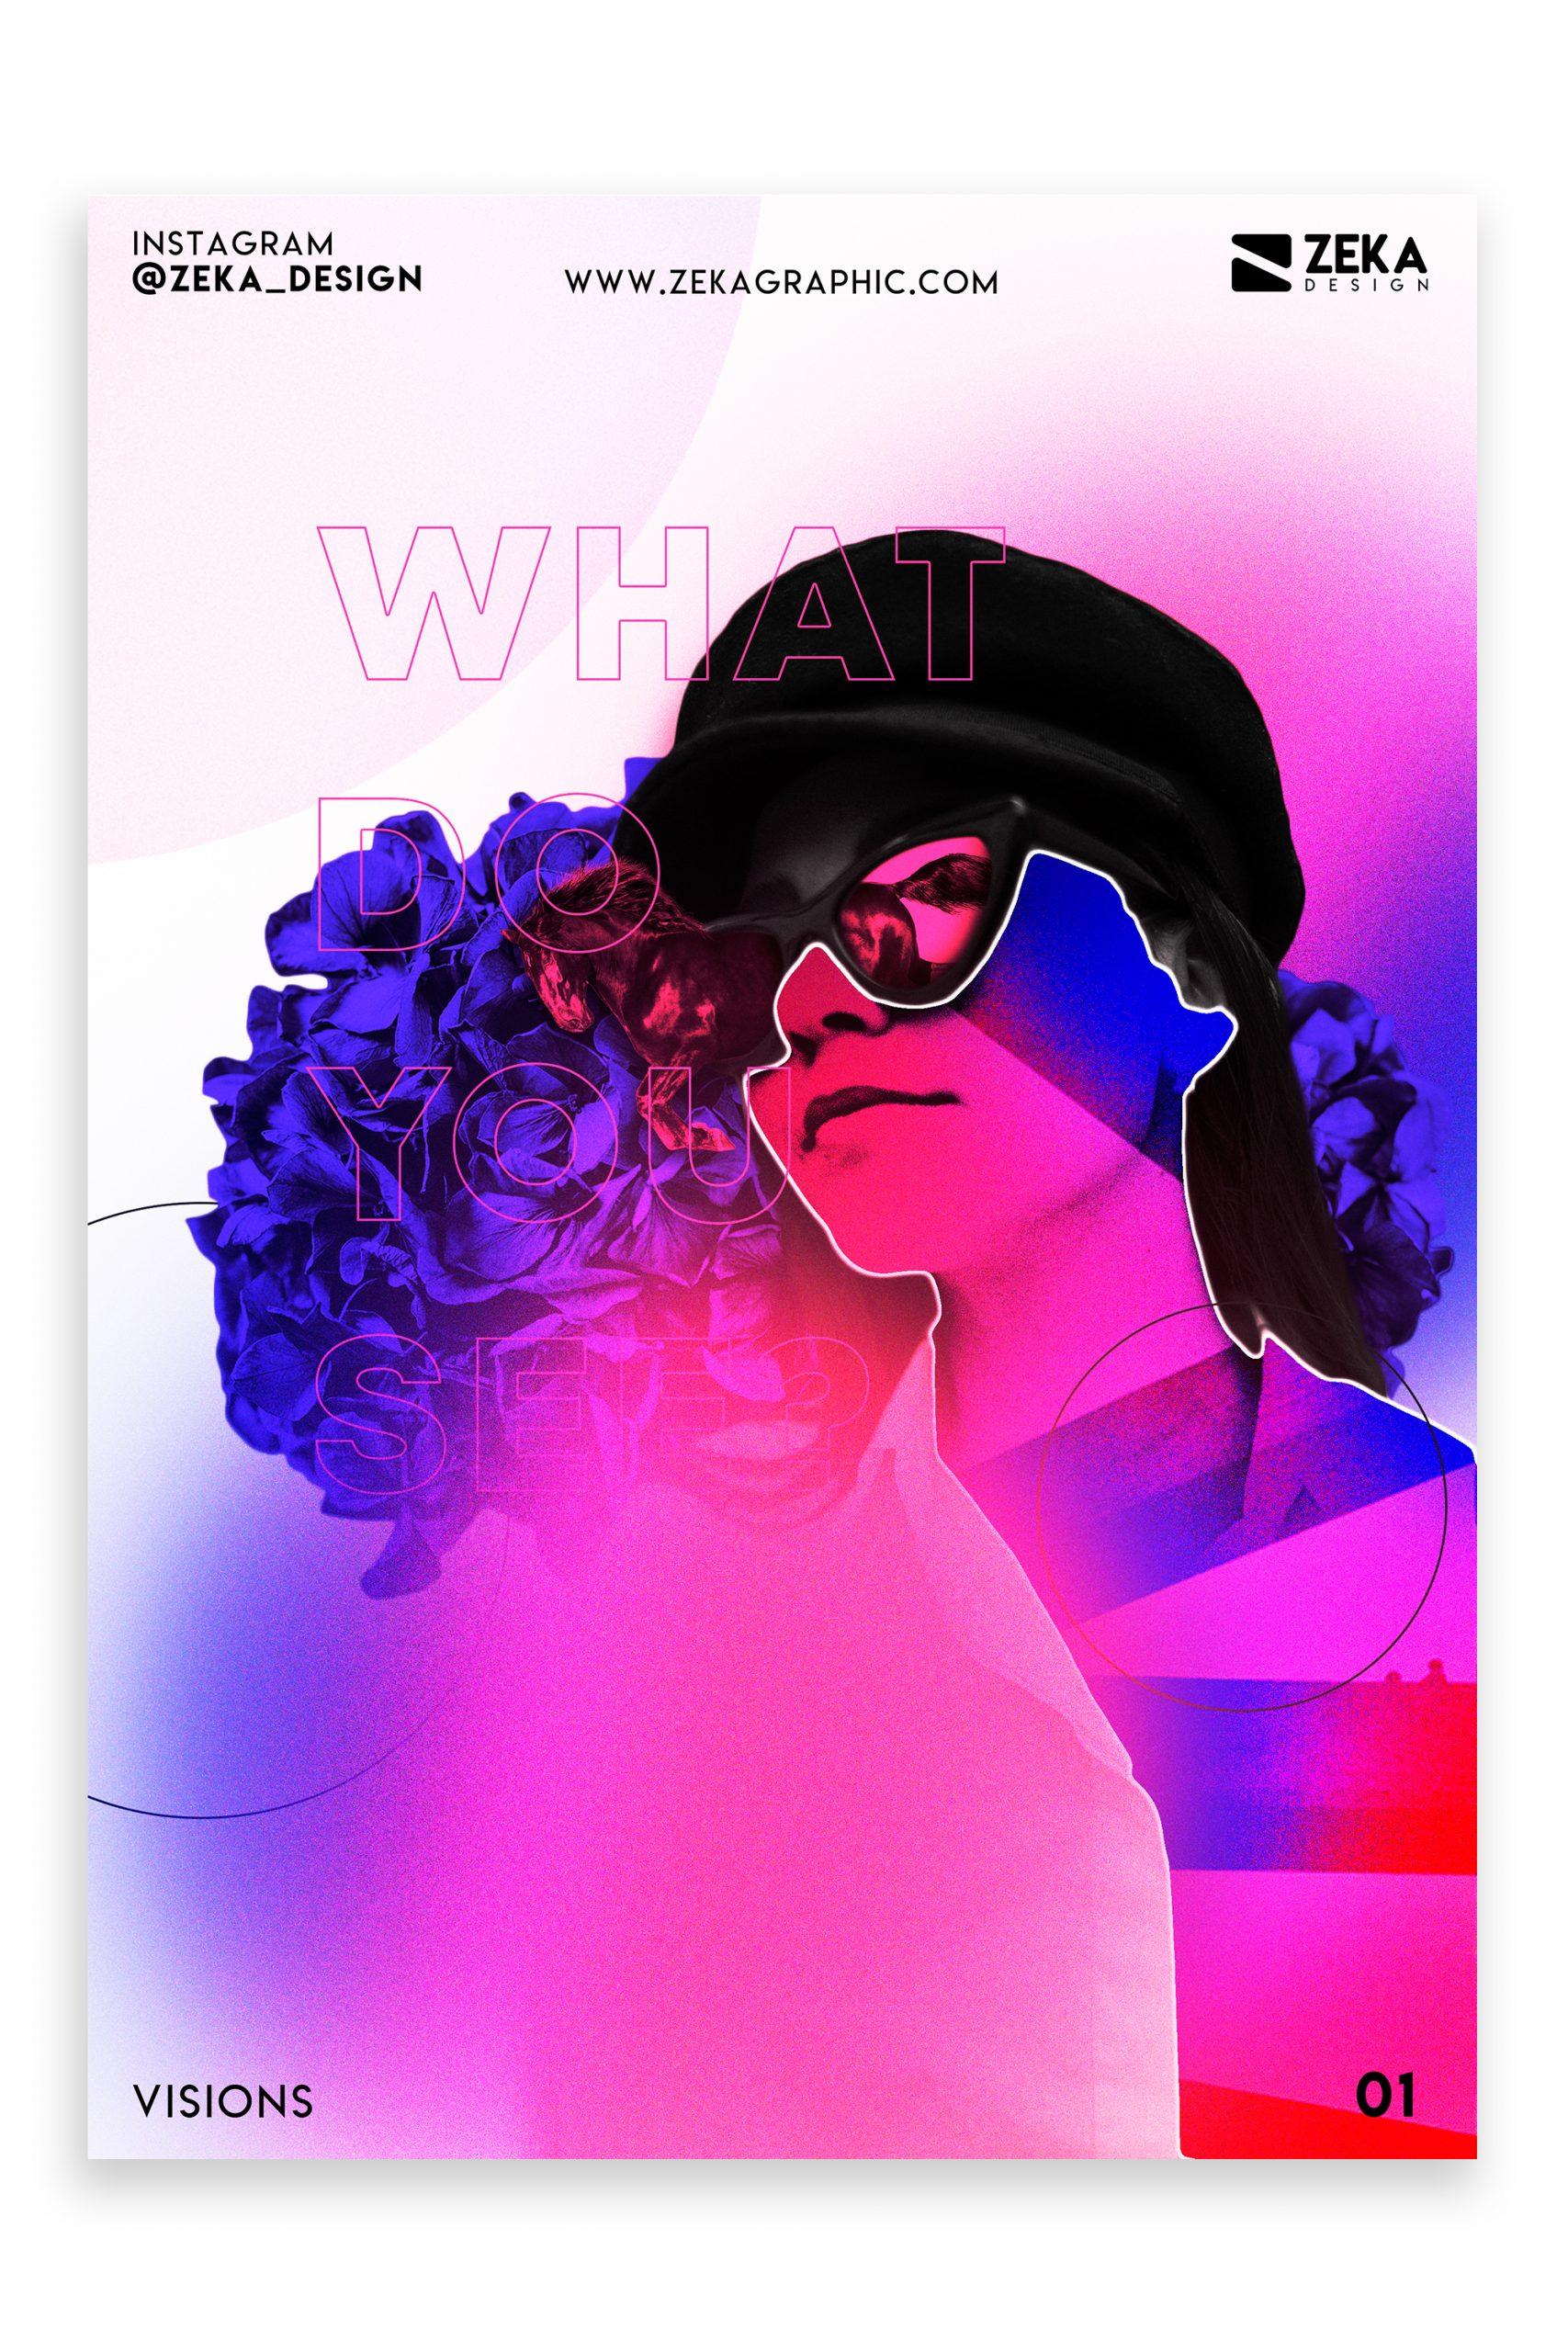 Visions Poster Design Inspiration Zeka Design Graphic Design Portfolio 1